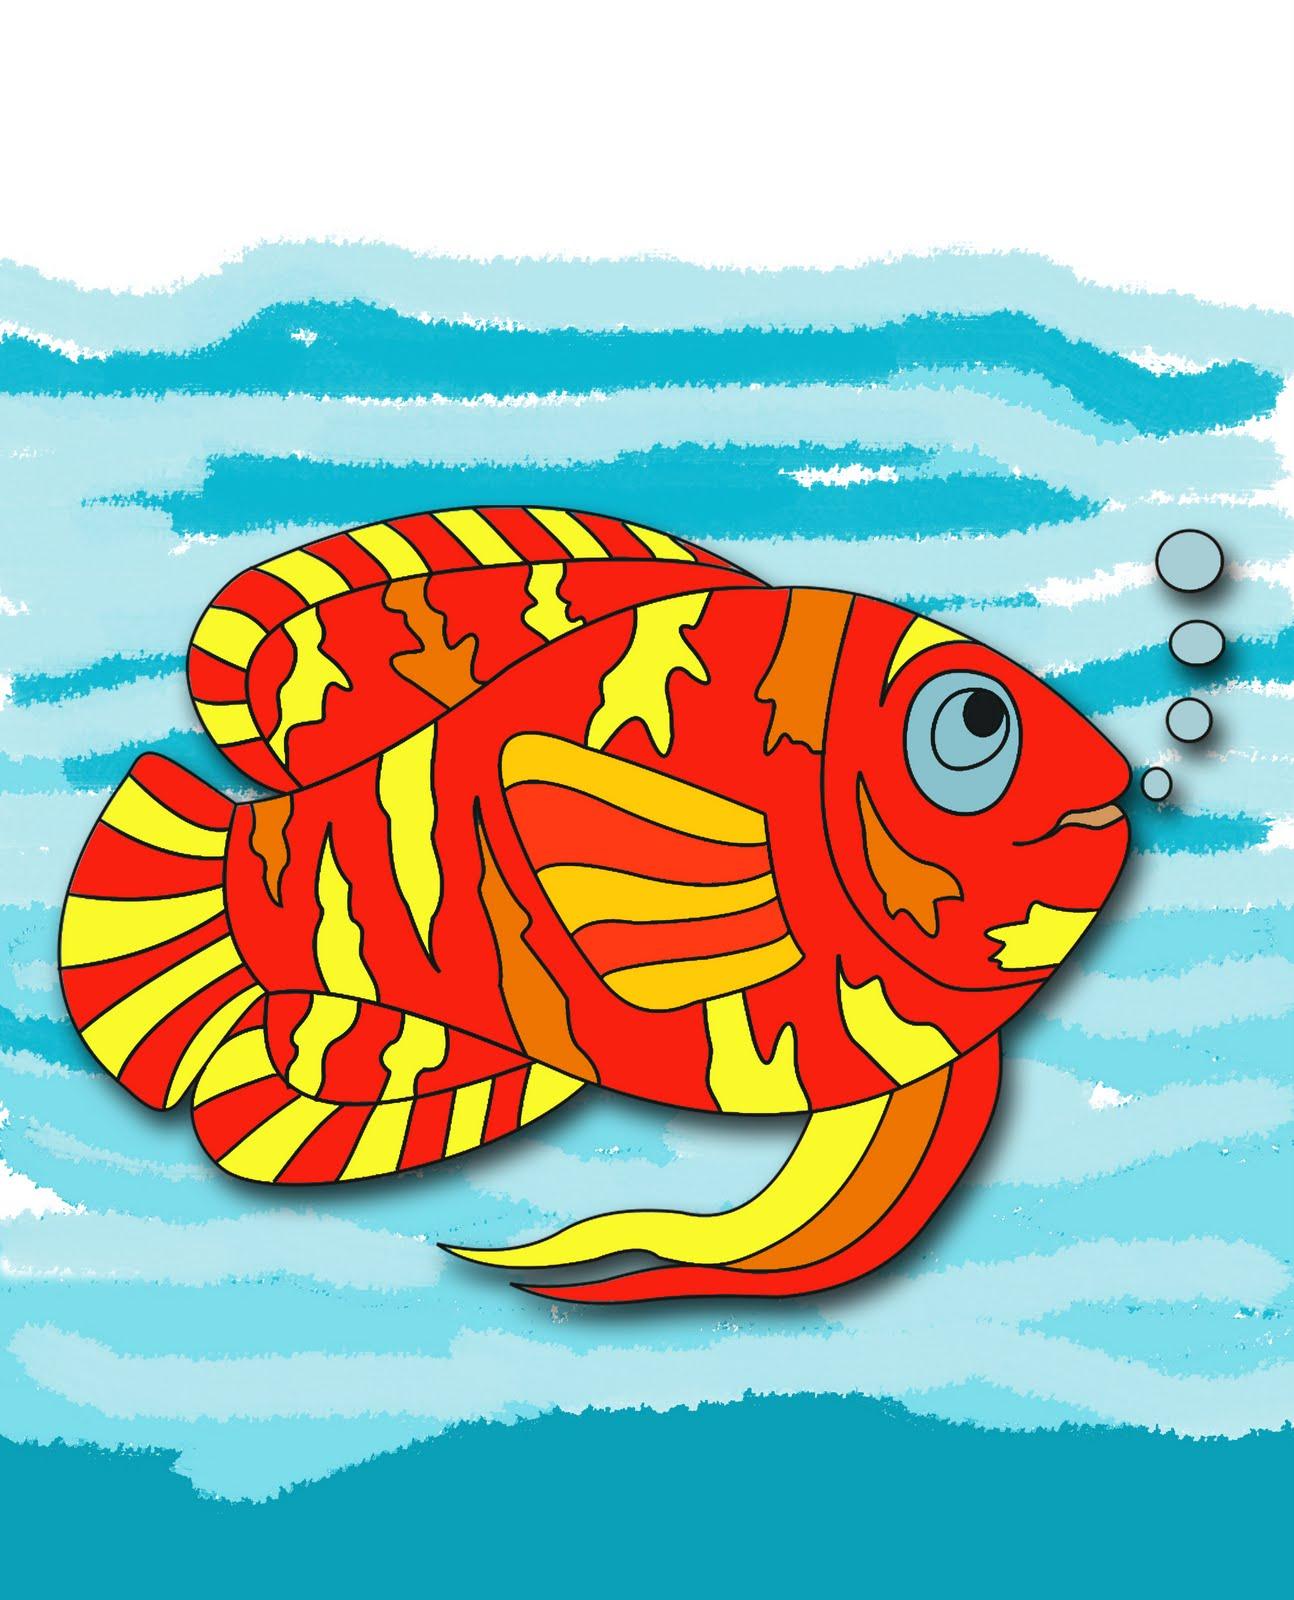 Daftar Contoh Gambar Mewarnai Ikan